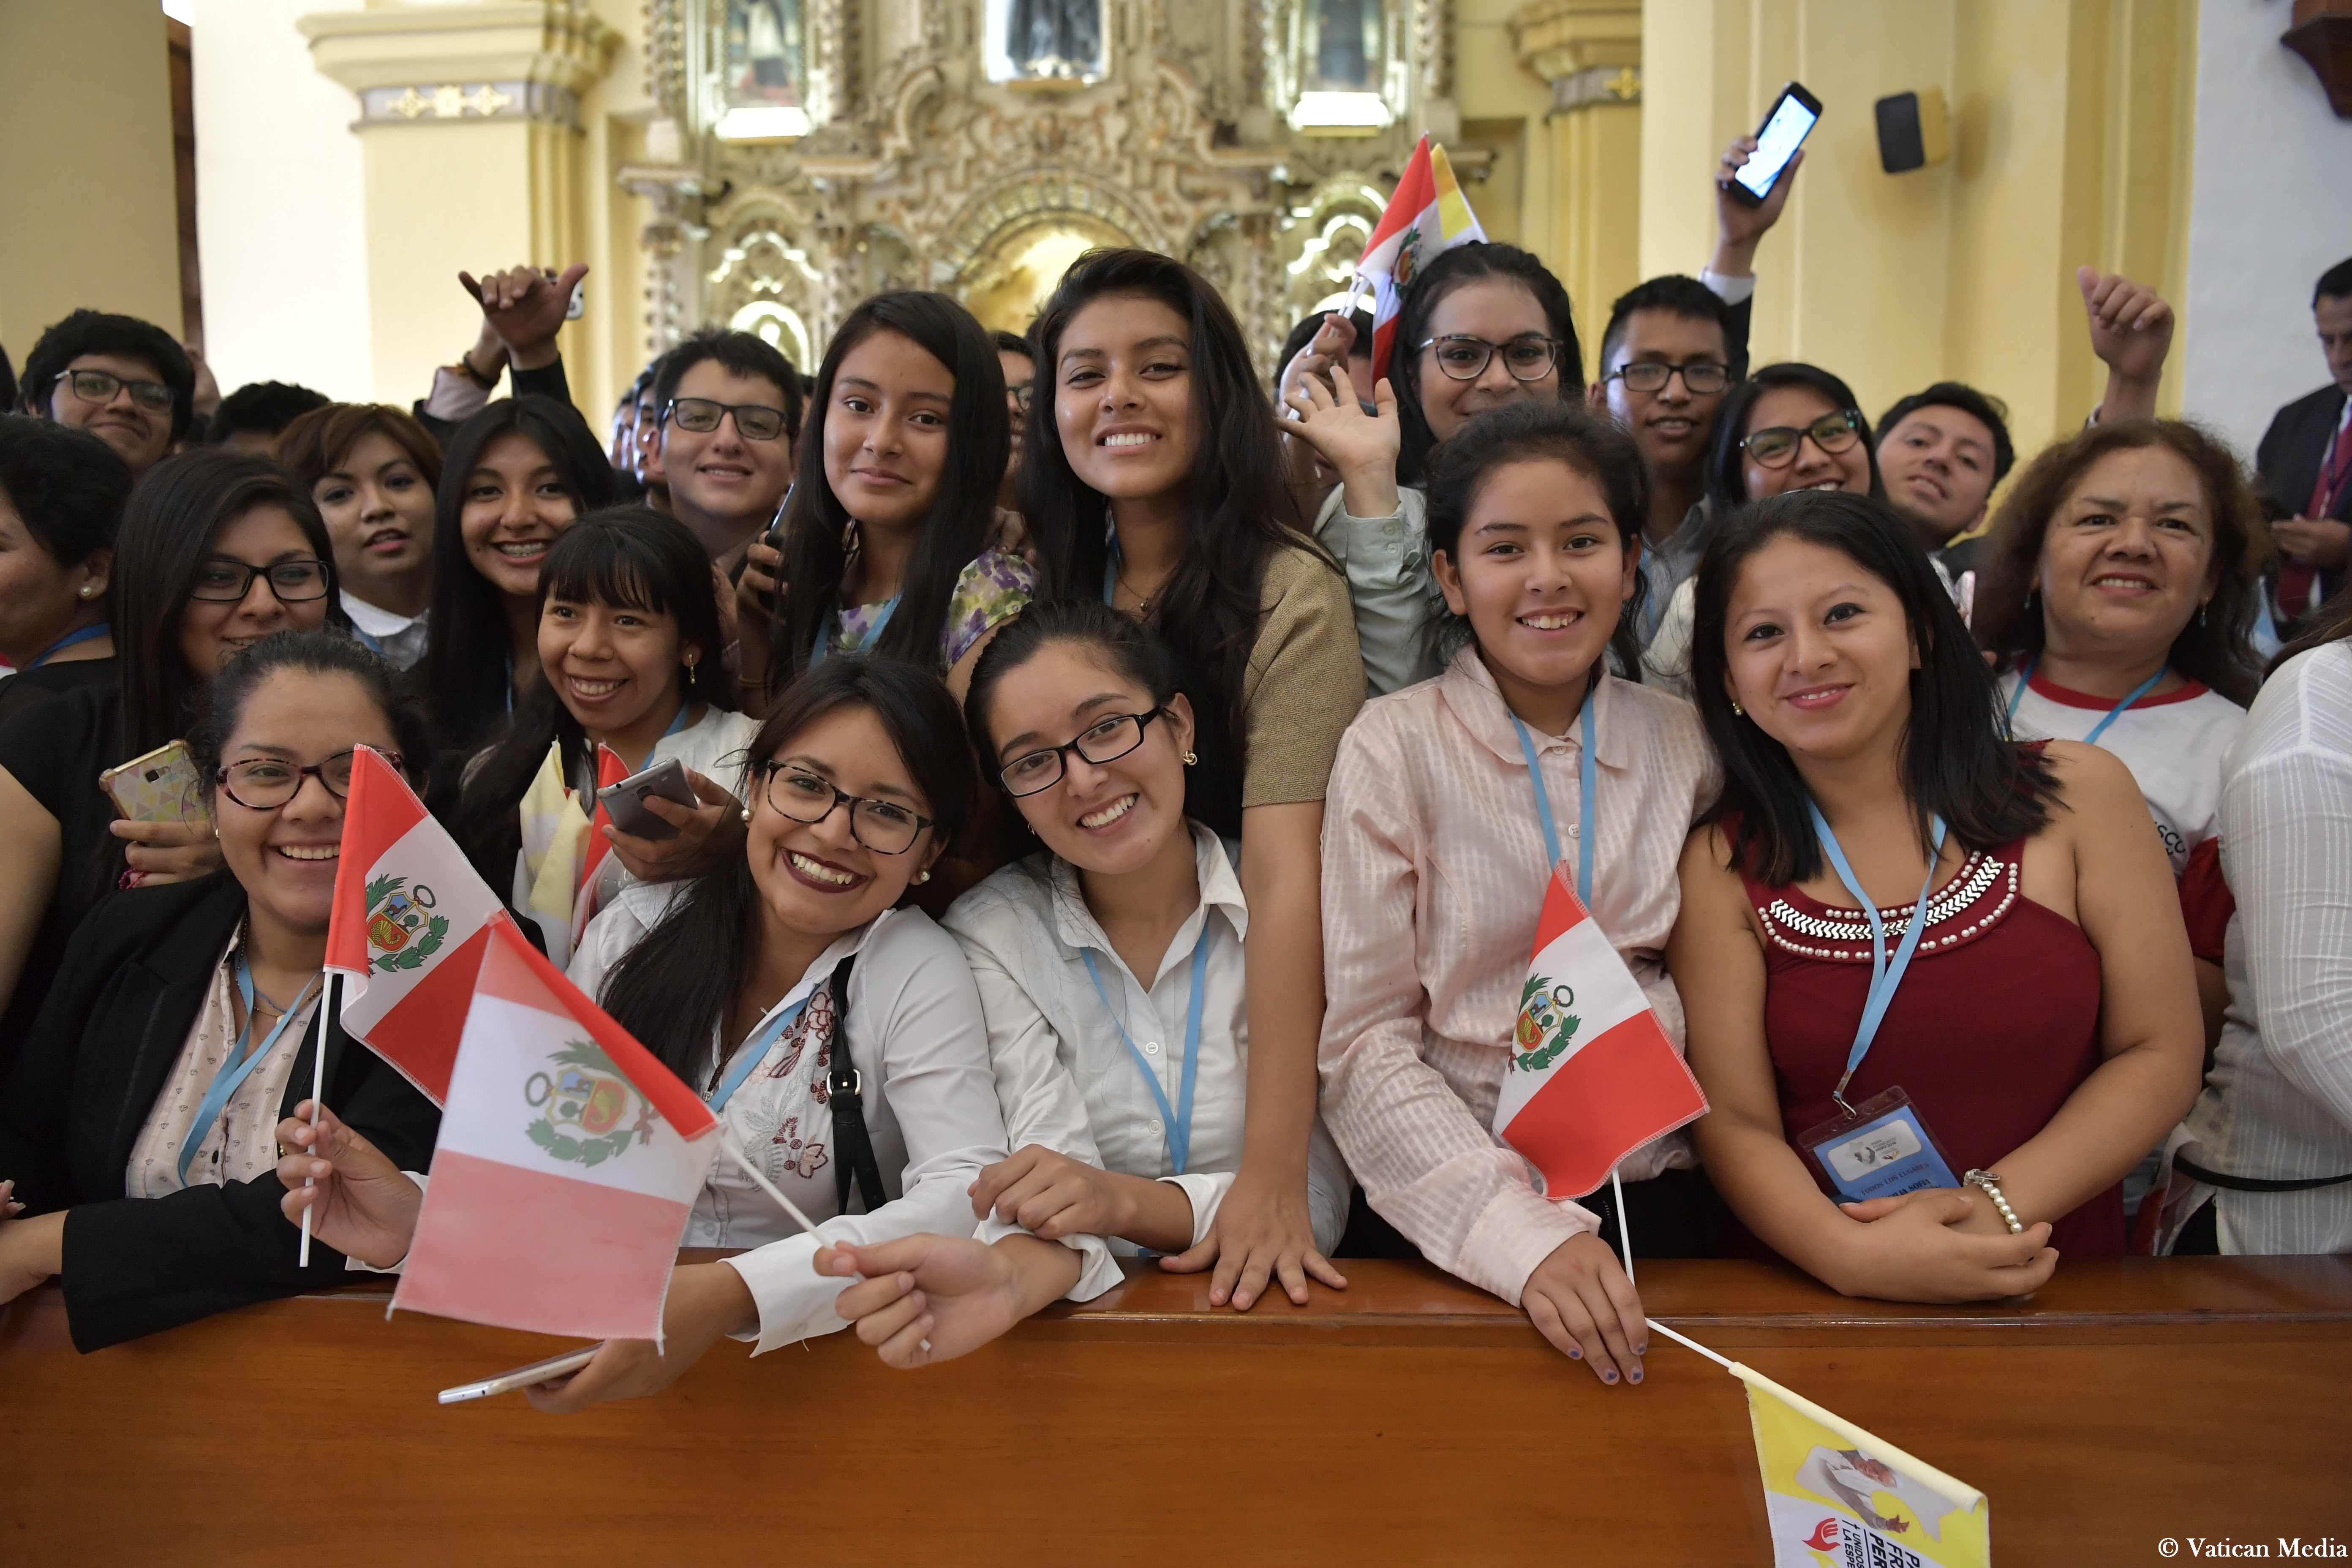 Visite à la cathédrale, Trujillo, Pérou © Vatican Media